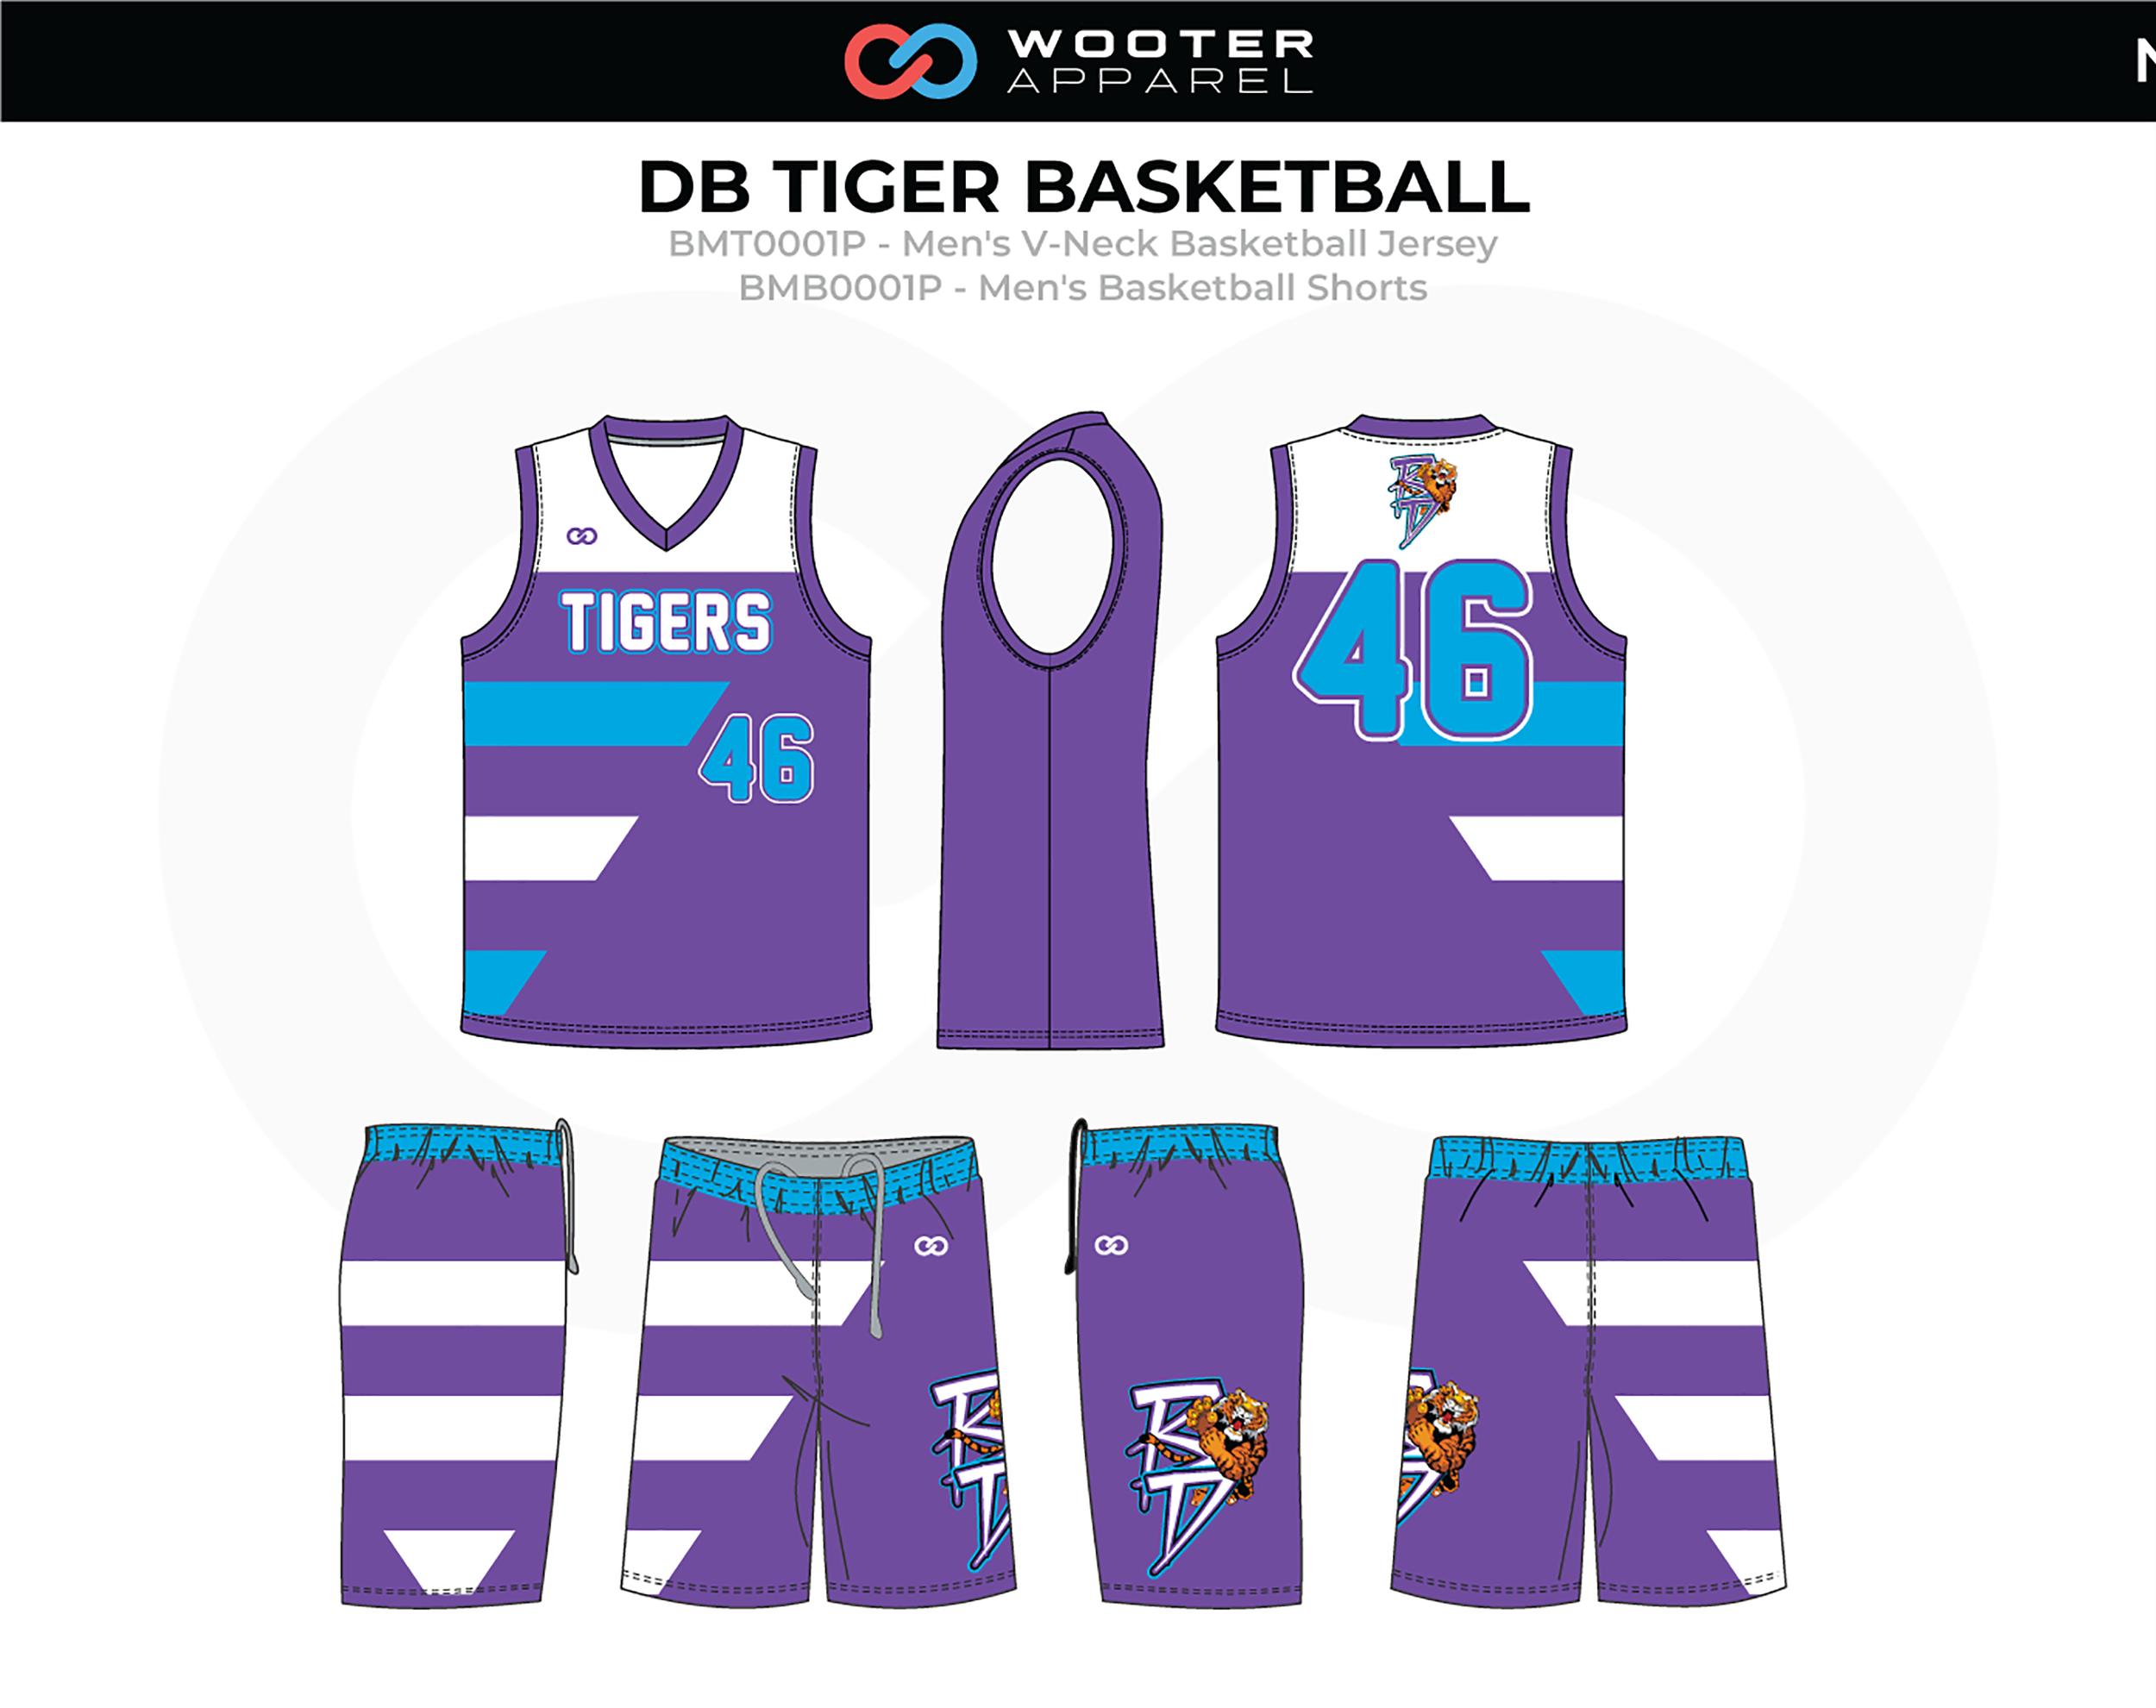 DB TIGER Lavender White Blue Men's V-Neck Basketball Uniform, Jersey and Shorts